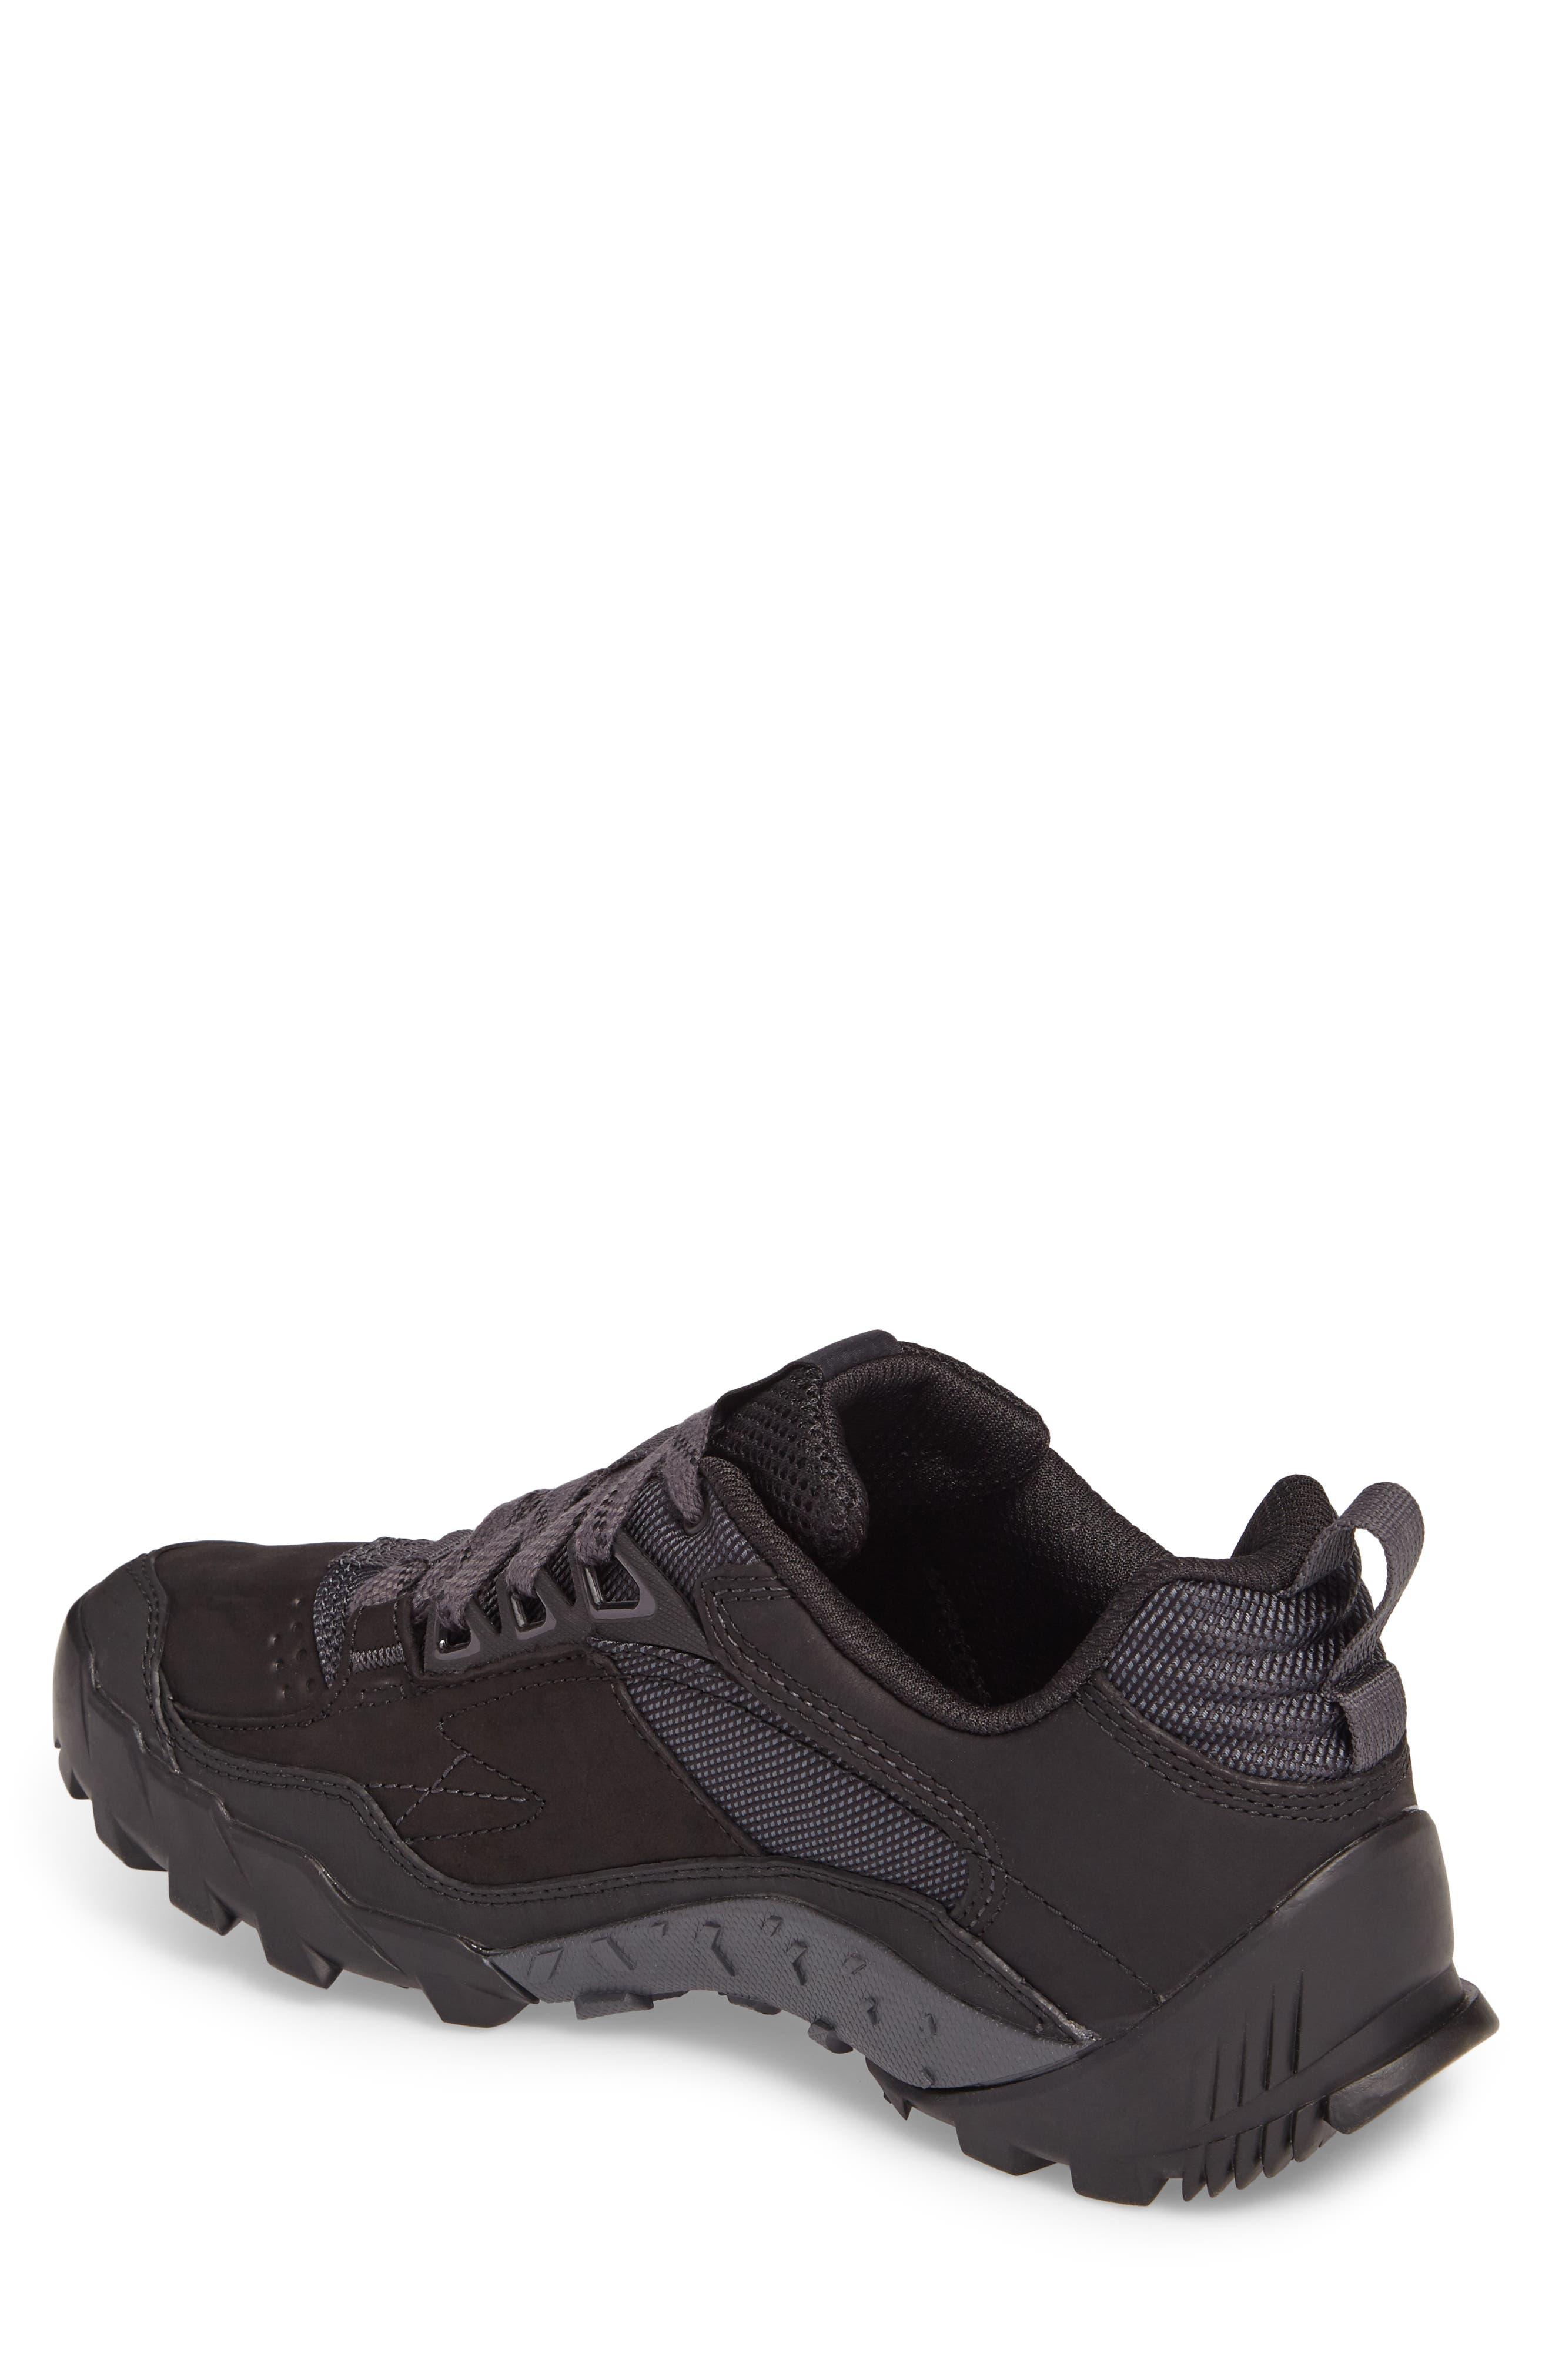 Annex Tak Low Hiking Shoe,                             Alternate thumbnail 2, color,                             Black Nubuck Leather